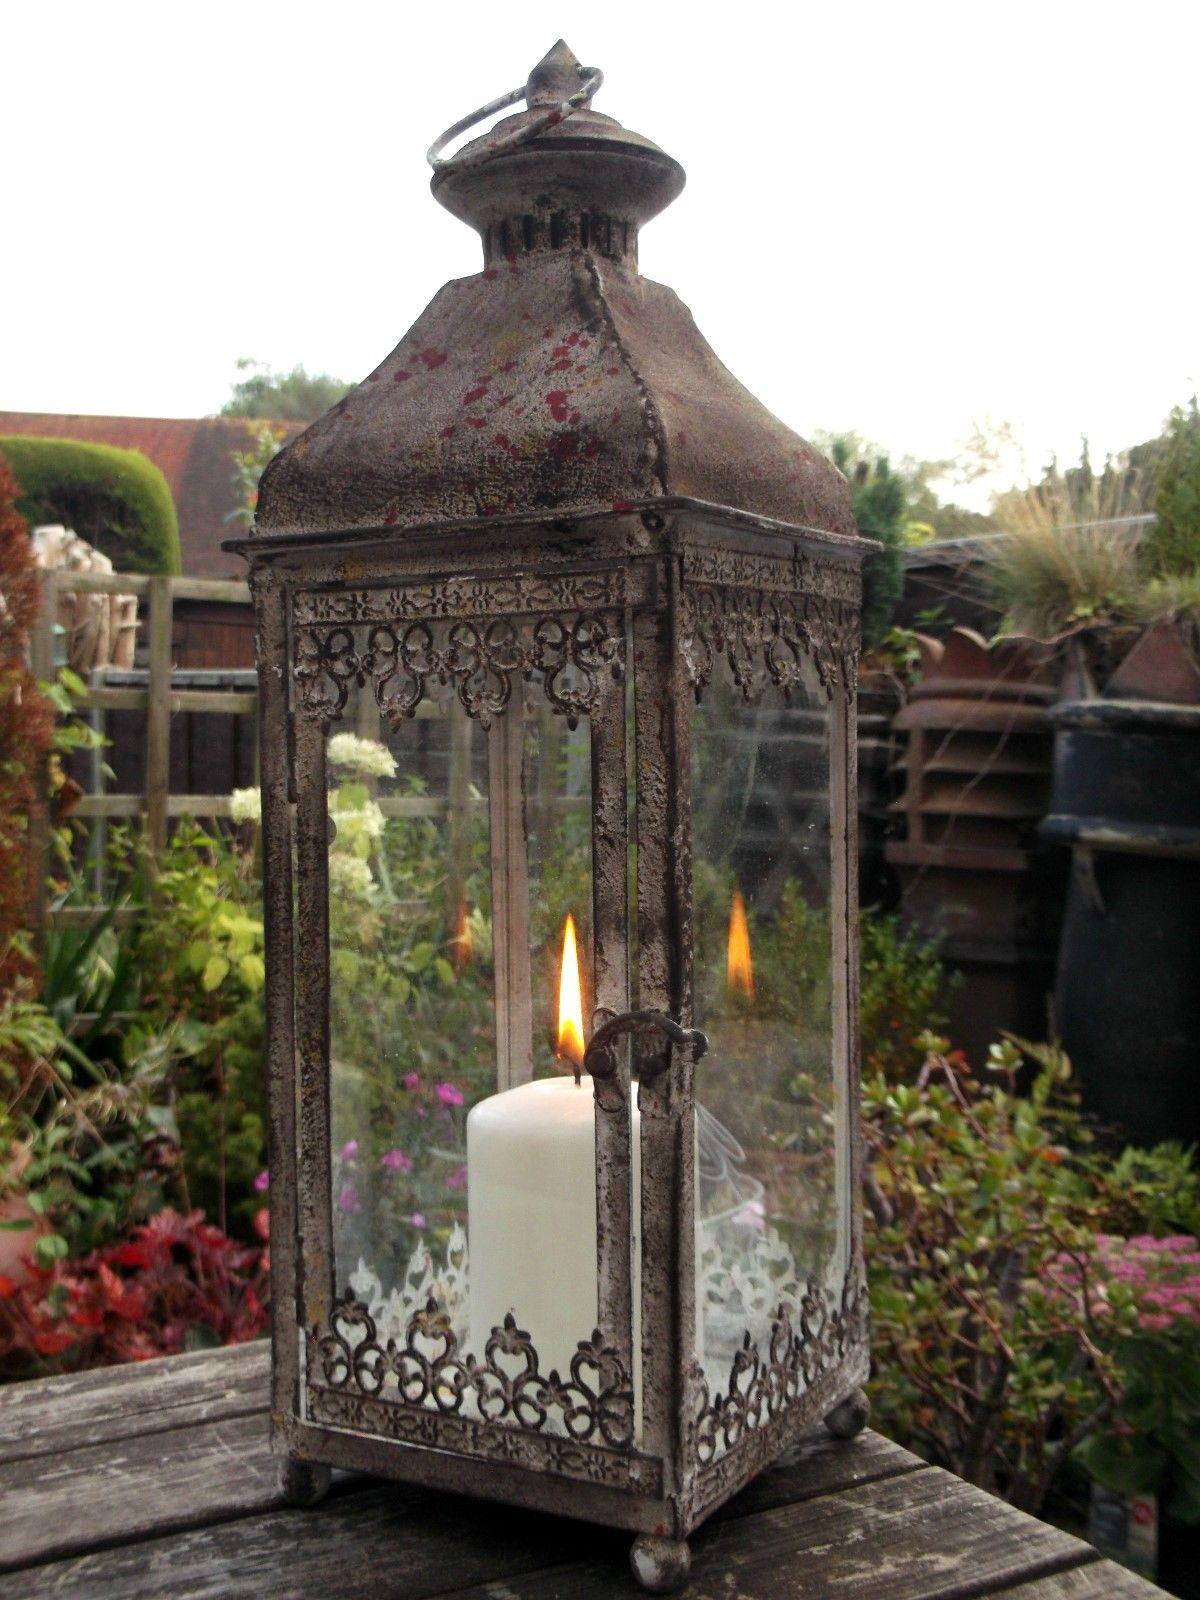 Antique Vintage Style Large Metal Lantern Candle Holder Garden Or Home Rustic